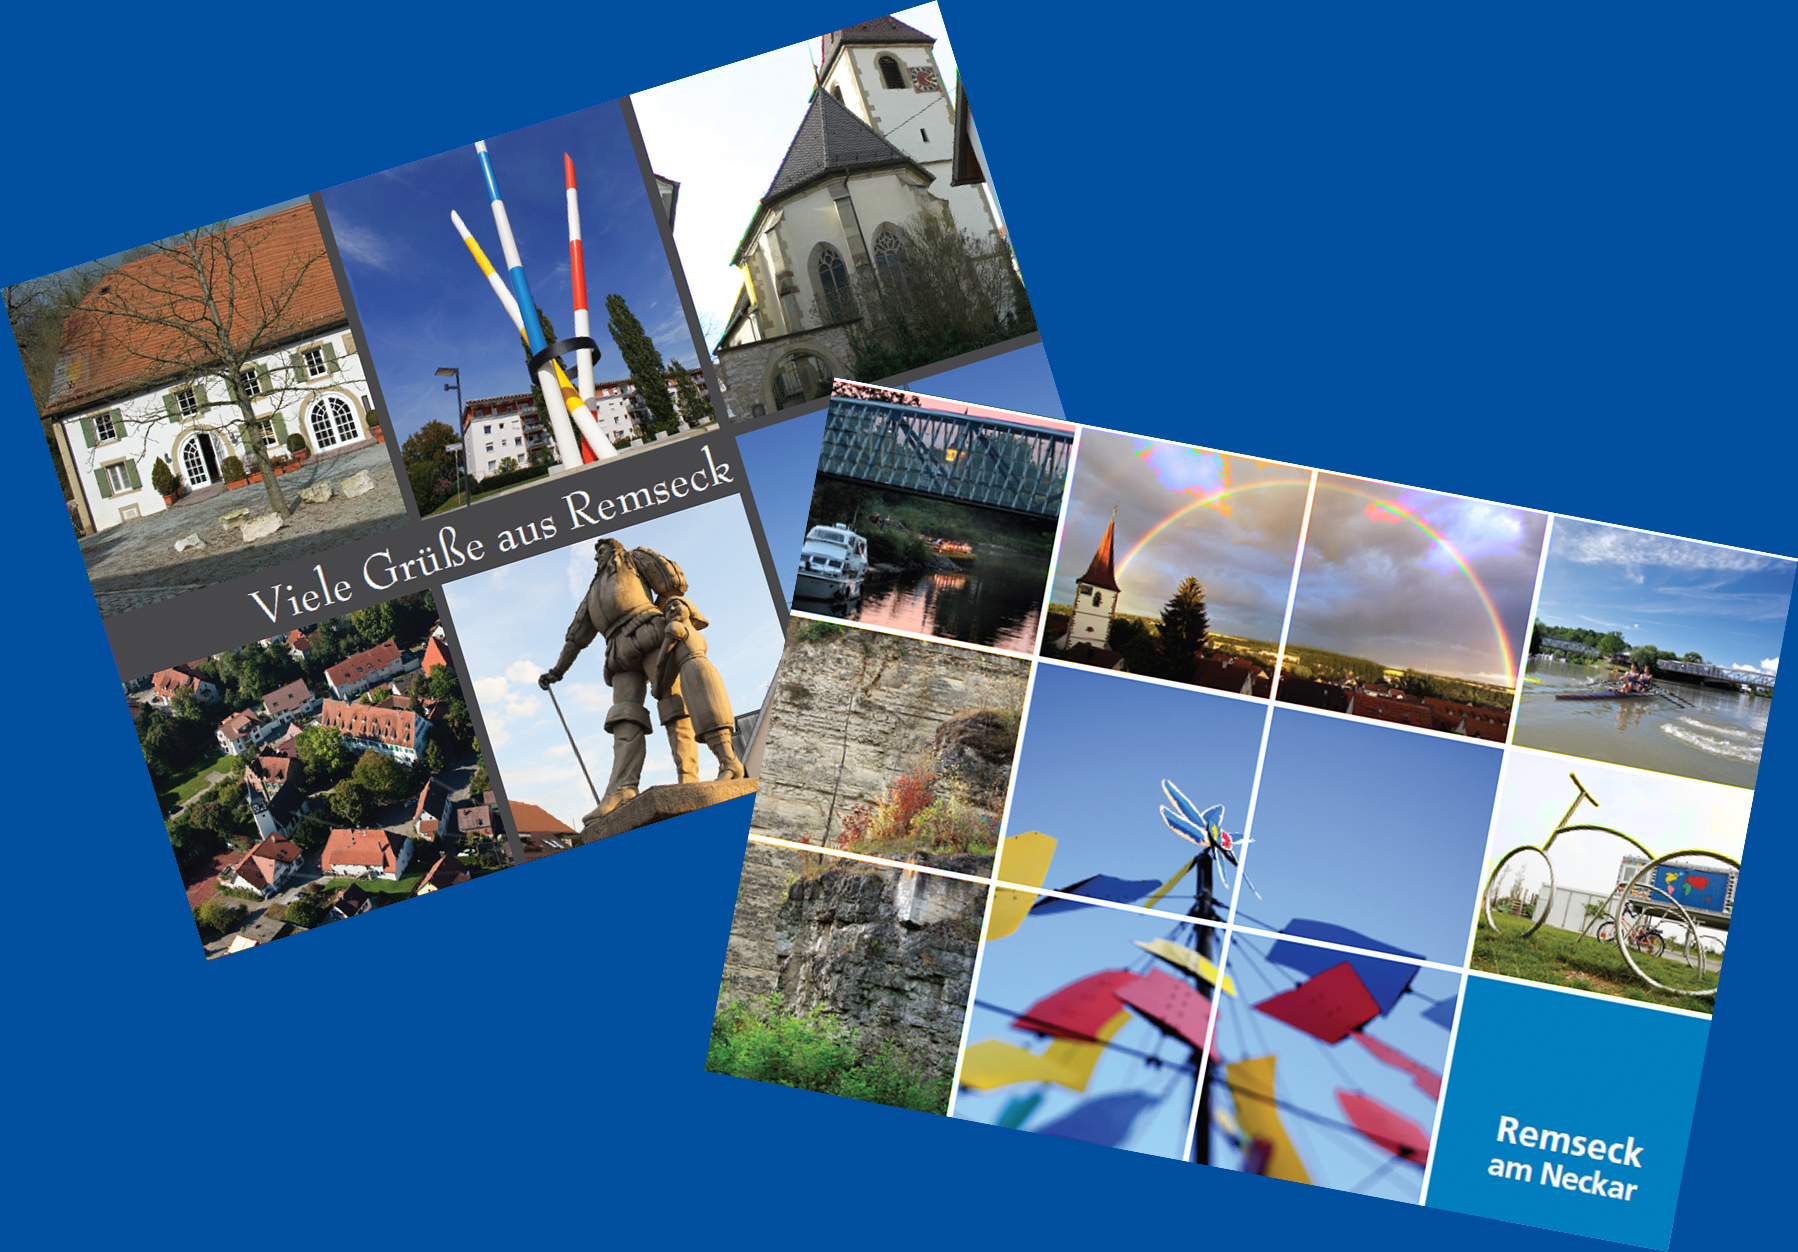 Ansichtskarten aus Remseck am Neckar